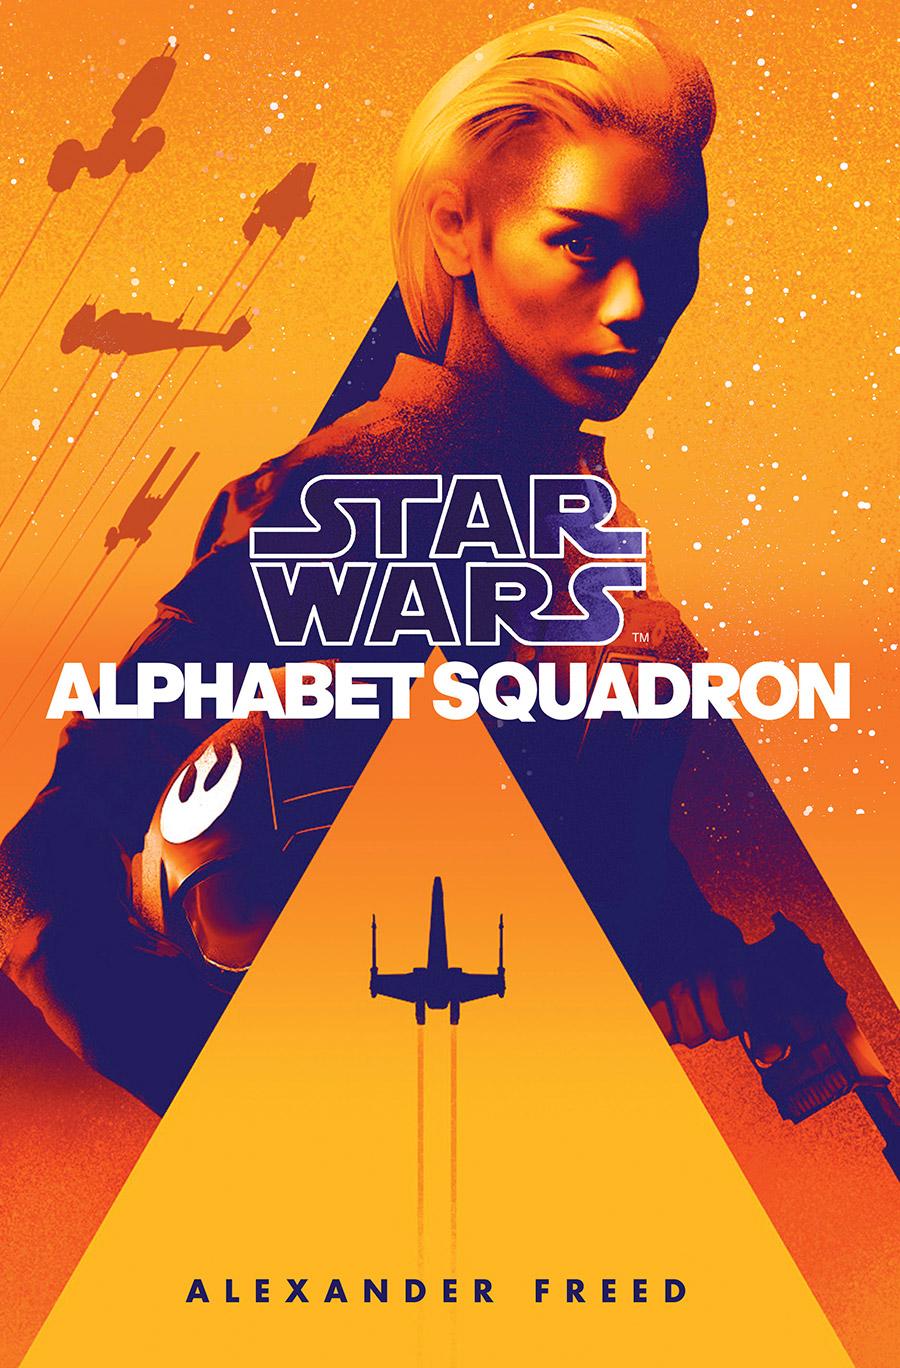 Star Wars Alphabet Squadron